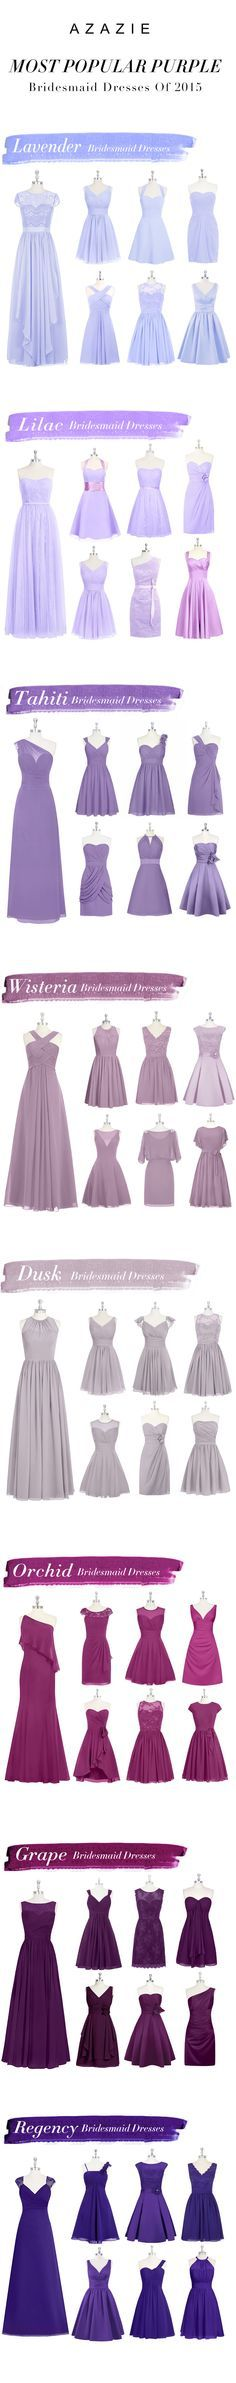 Most Popular Purple Bridesmaid Dresses By Azazie.